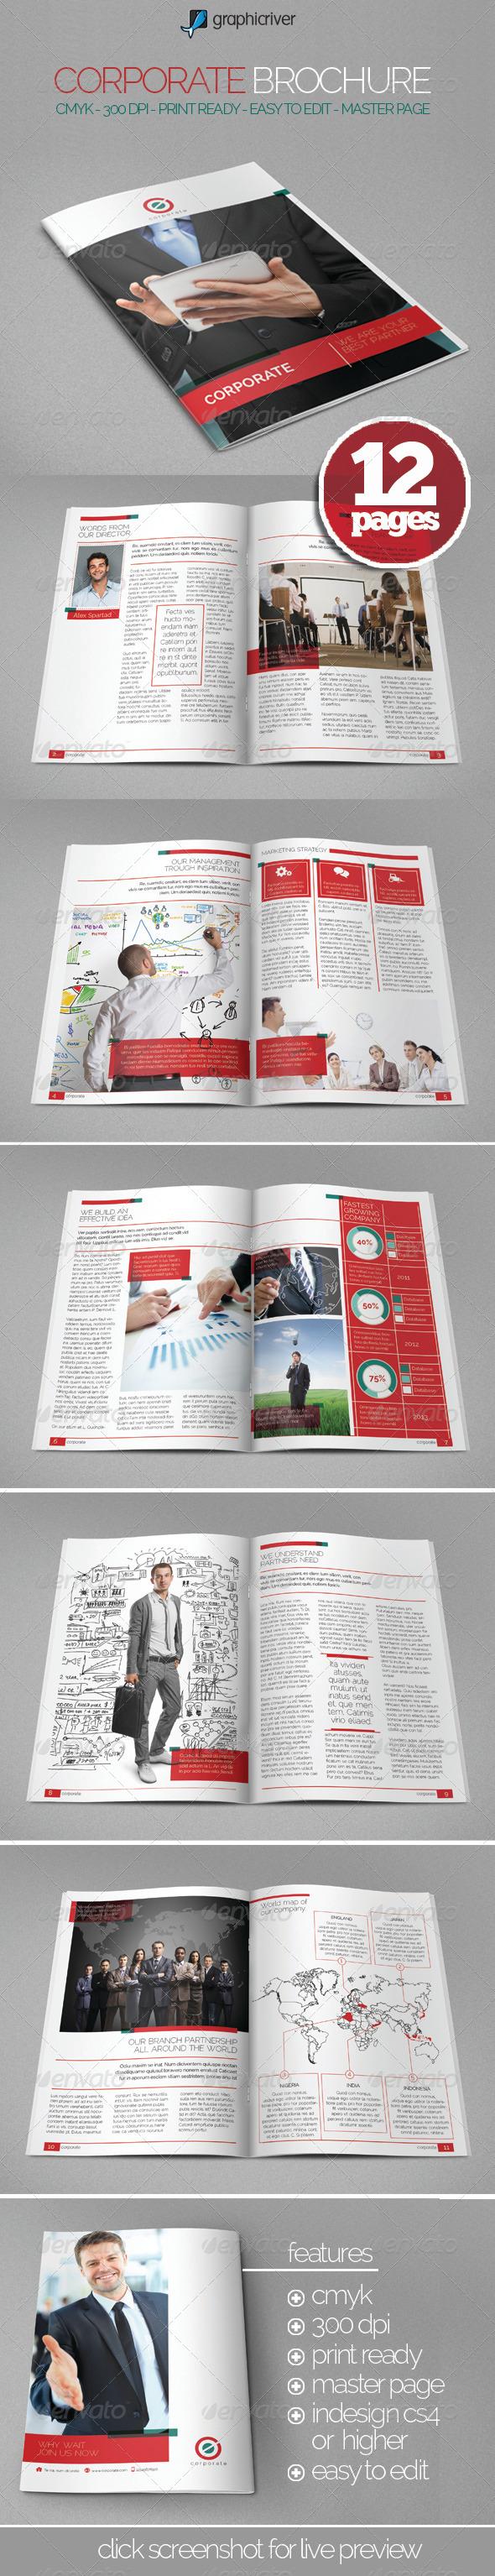 GraphicRiver Easy Corporate Brochure 6204230